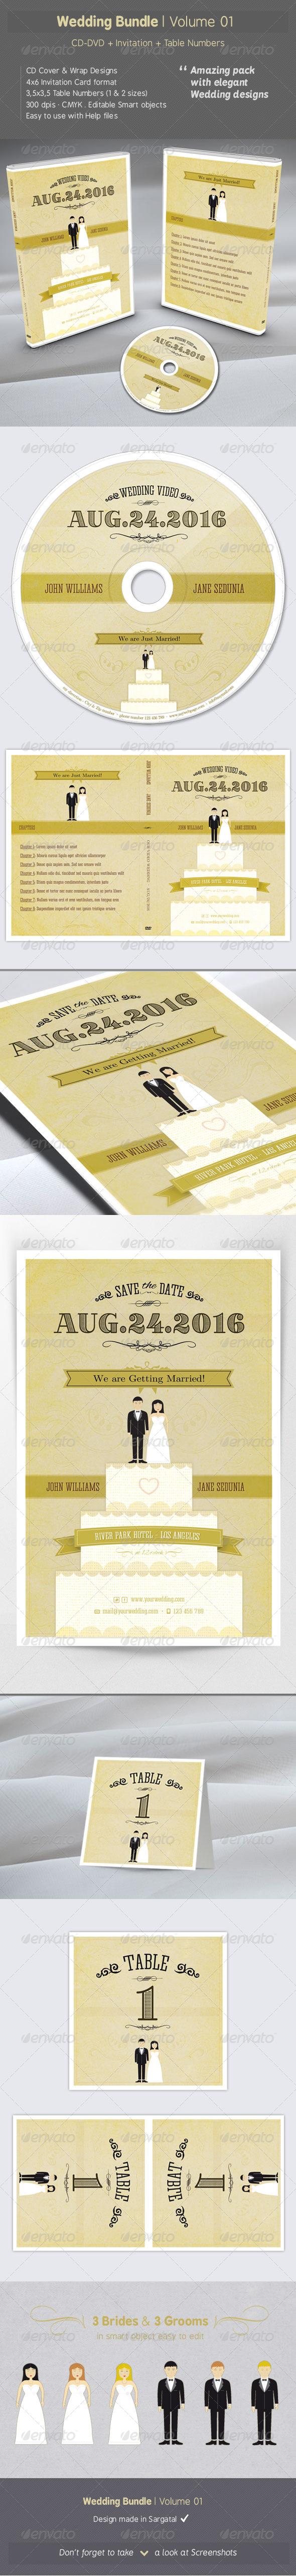 GraphicRiver Wedding Bundle Volume 01 6703474